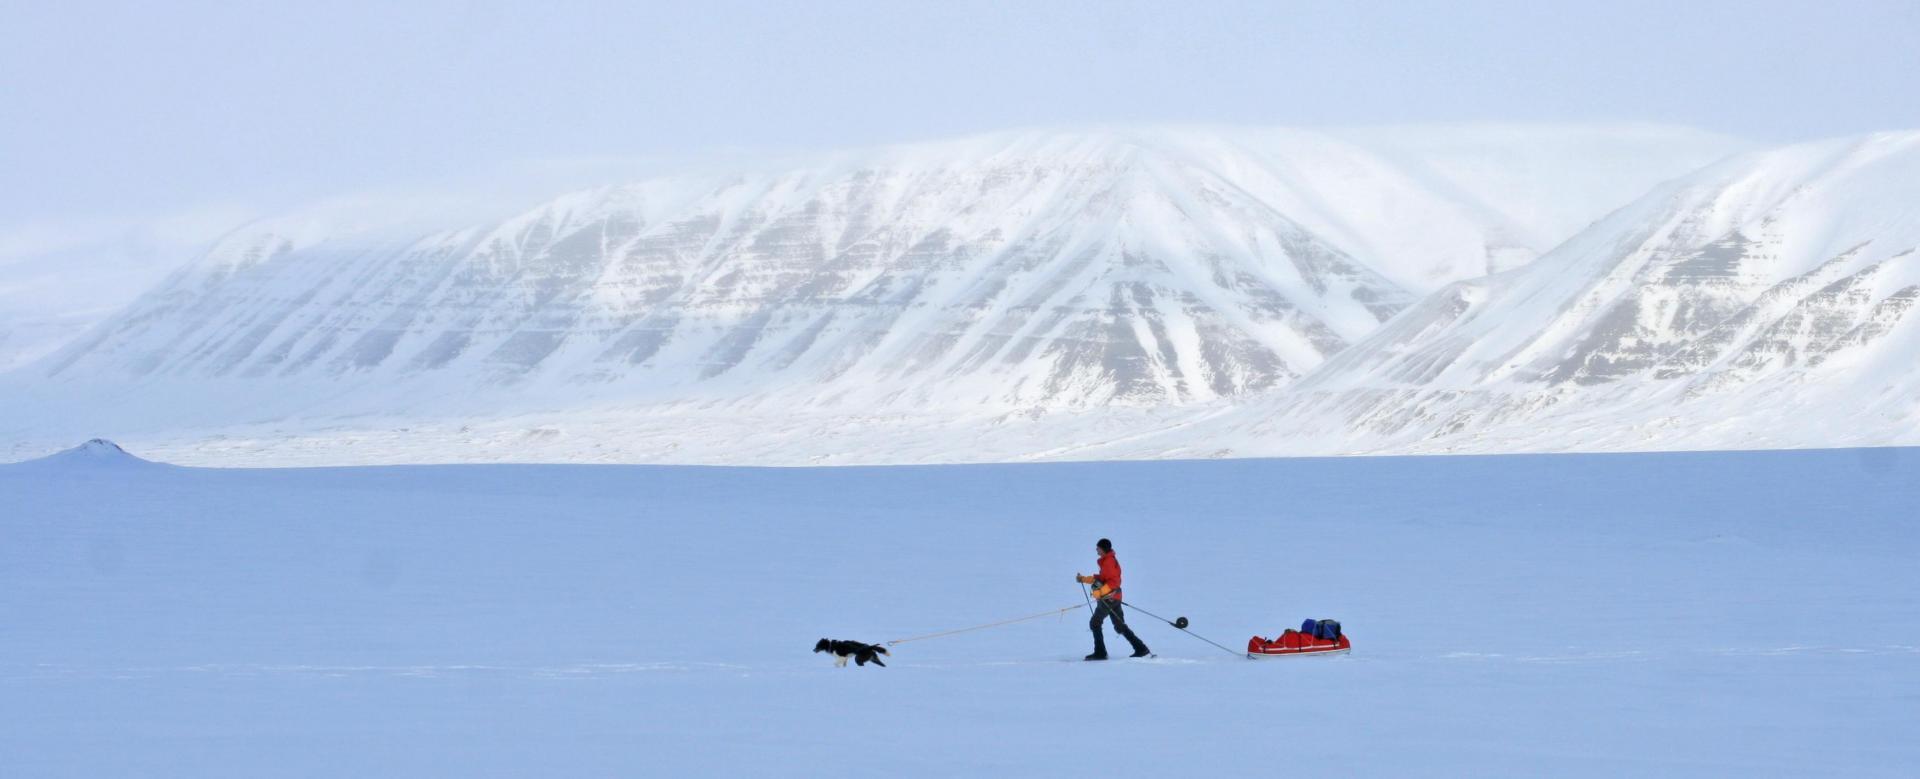 Voyage à la neige Norvège : Ski ou raquette : le glacier von post